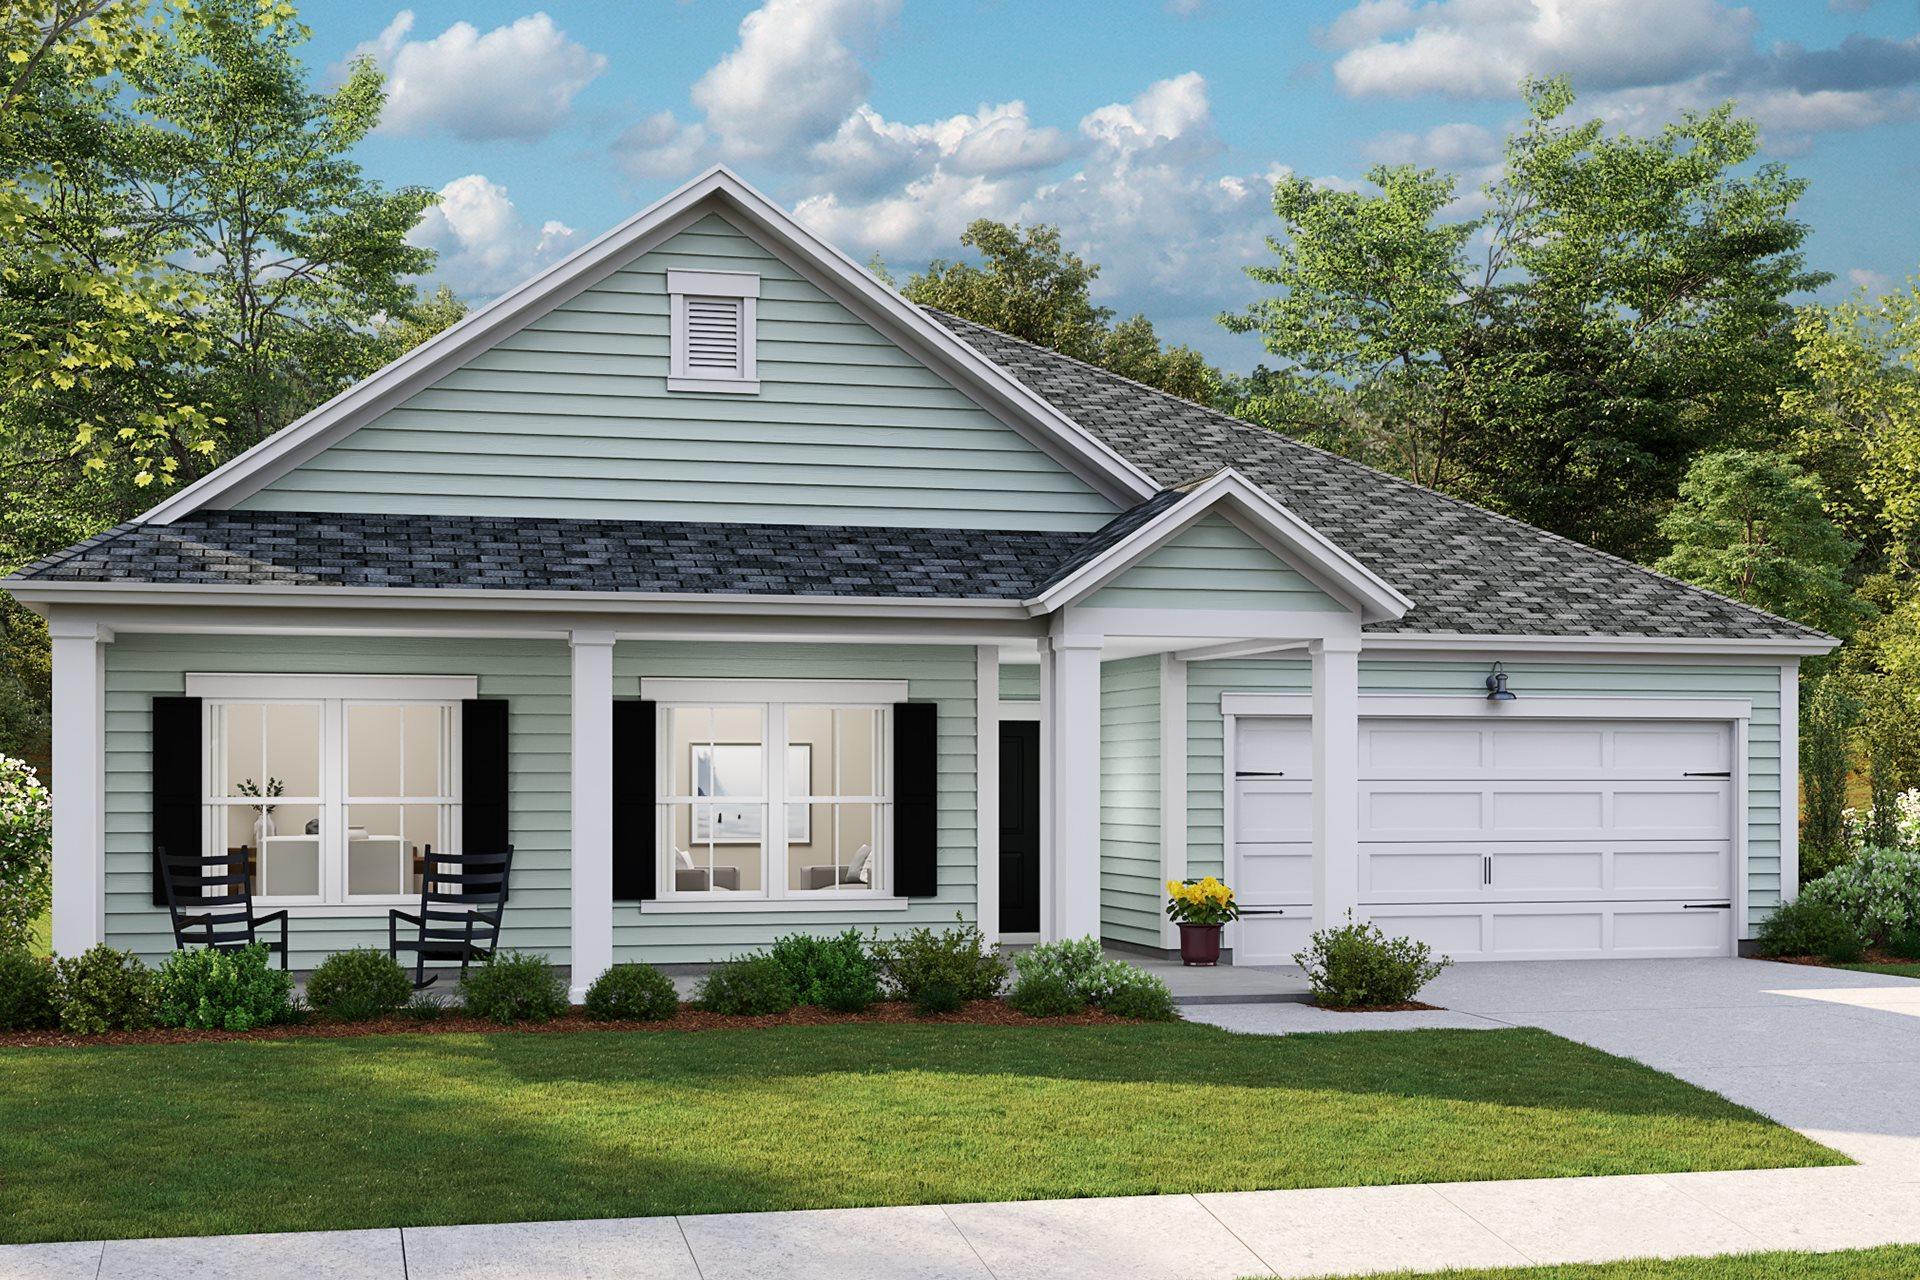 Cane Bay Plantation Homes For Sale - 205 Granton Edge, Summerville, SC - 8